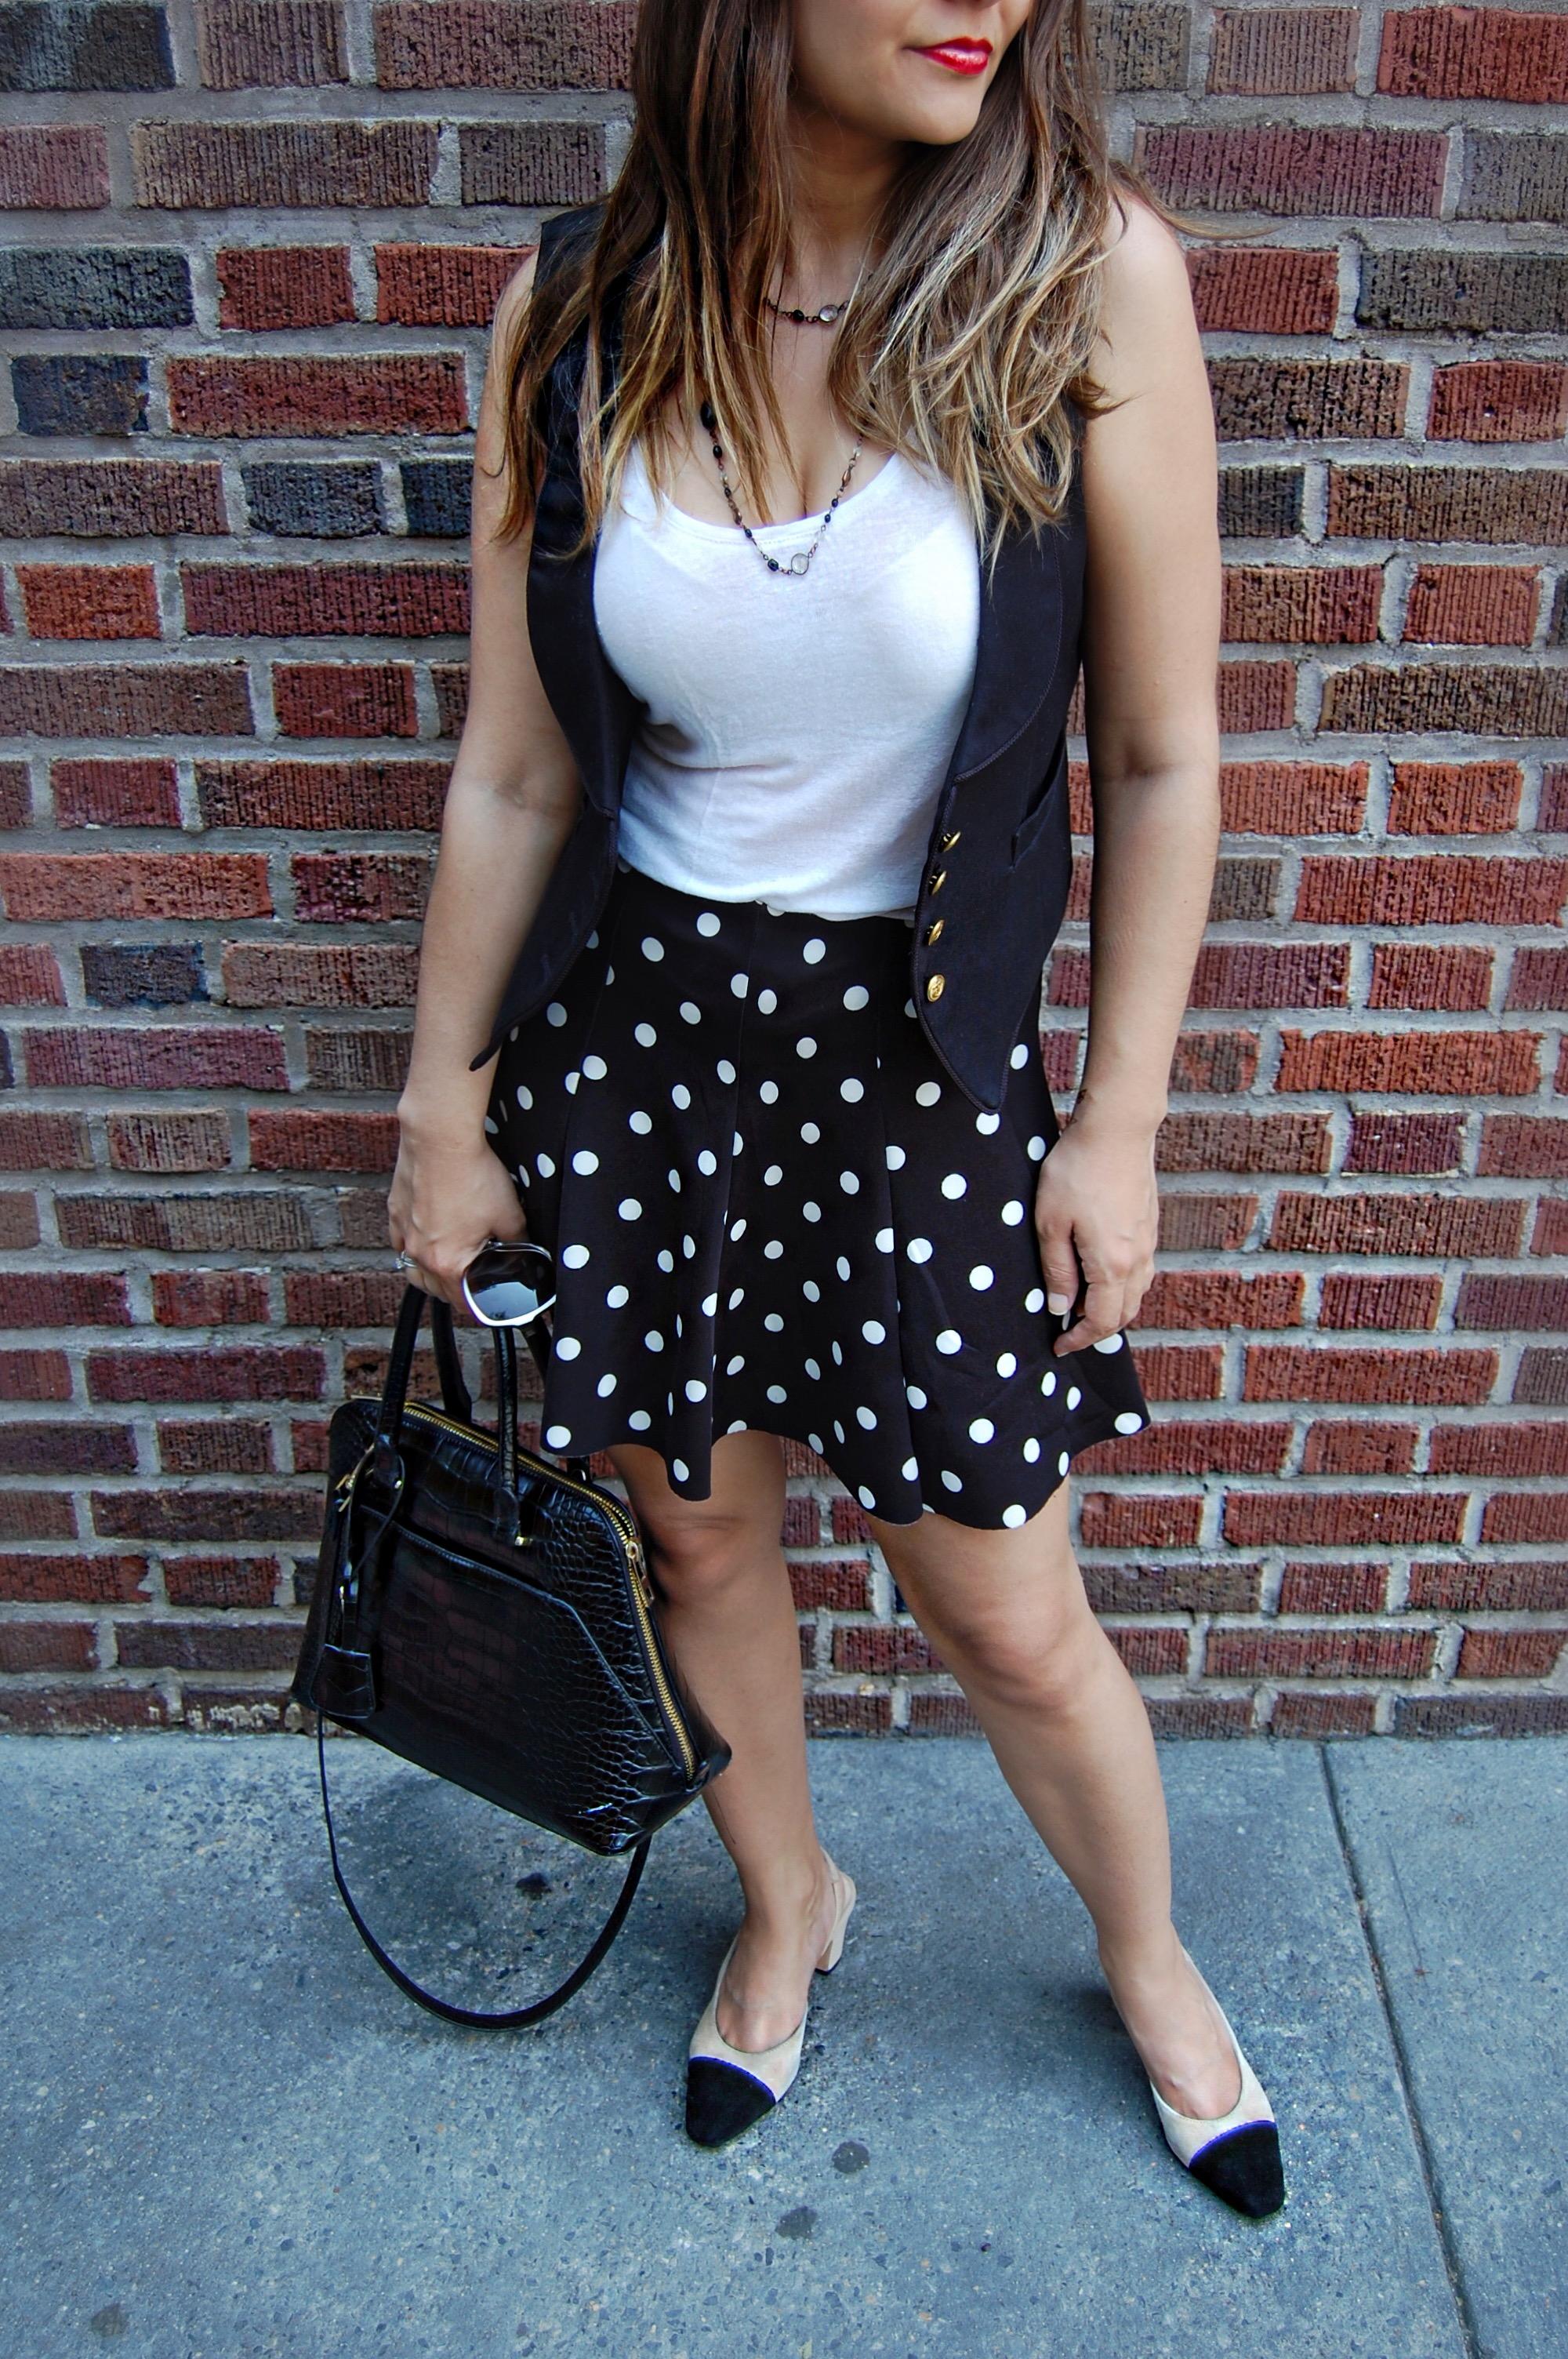 west_village_new_york_fashion_blogger_alley_girl4